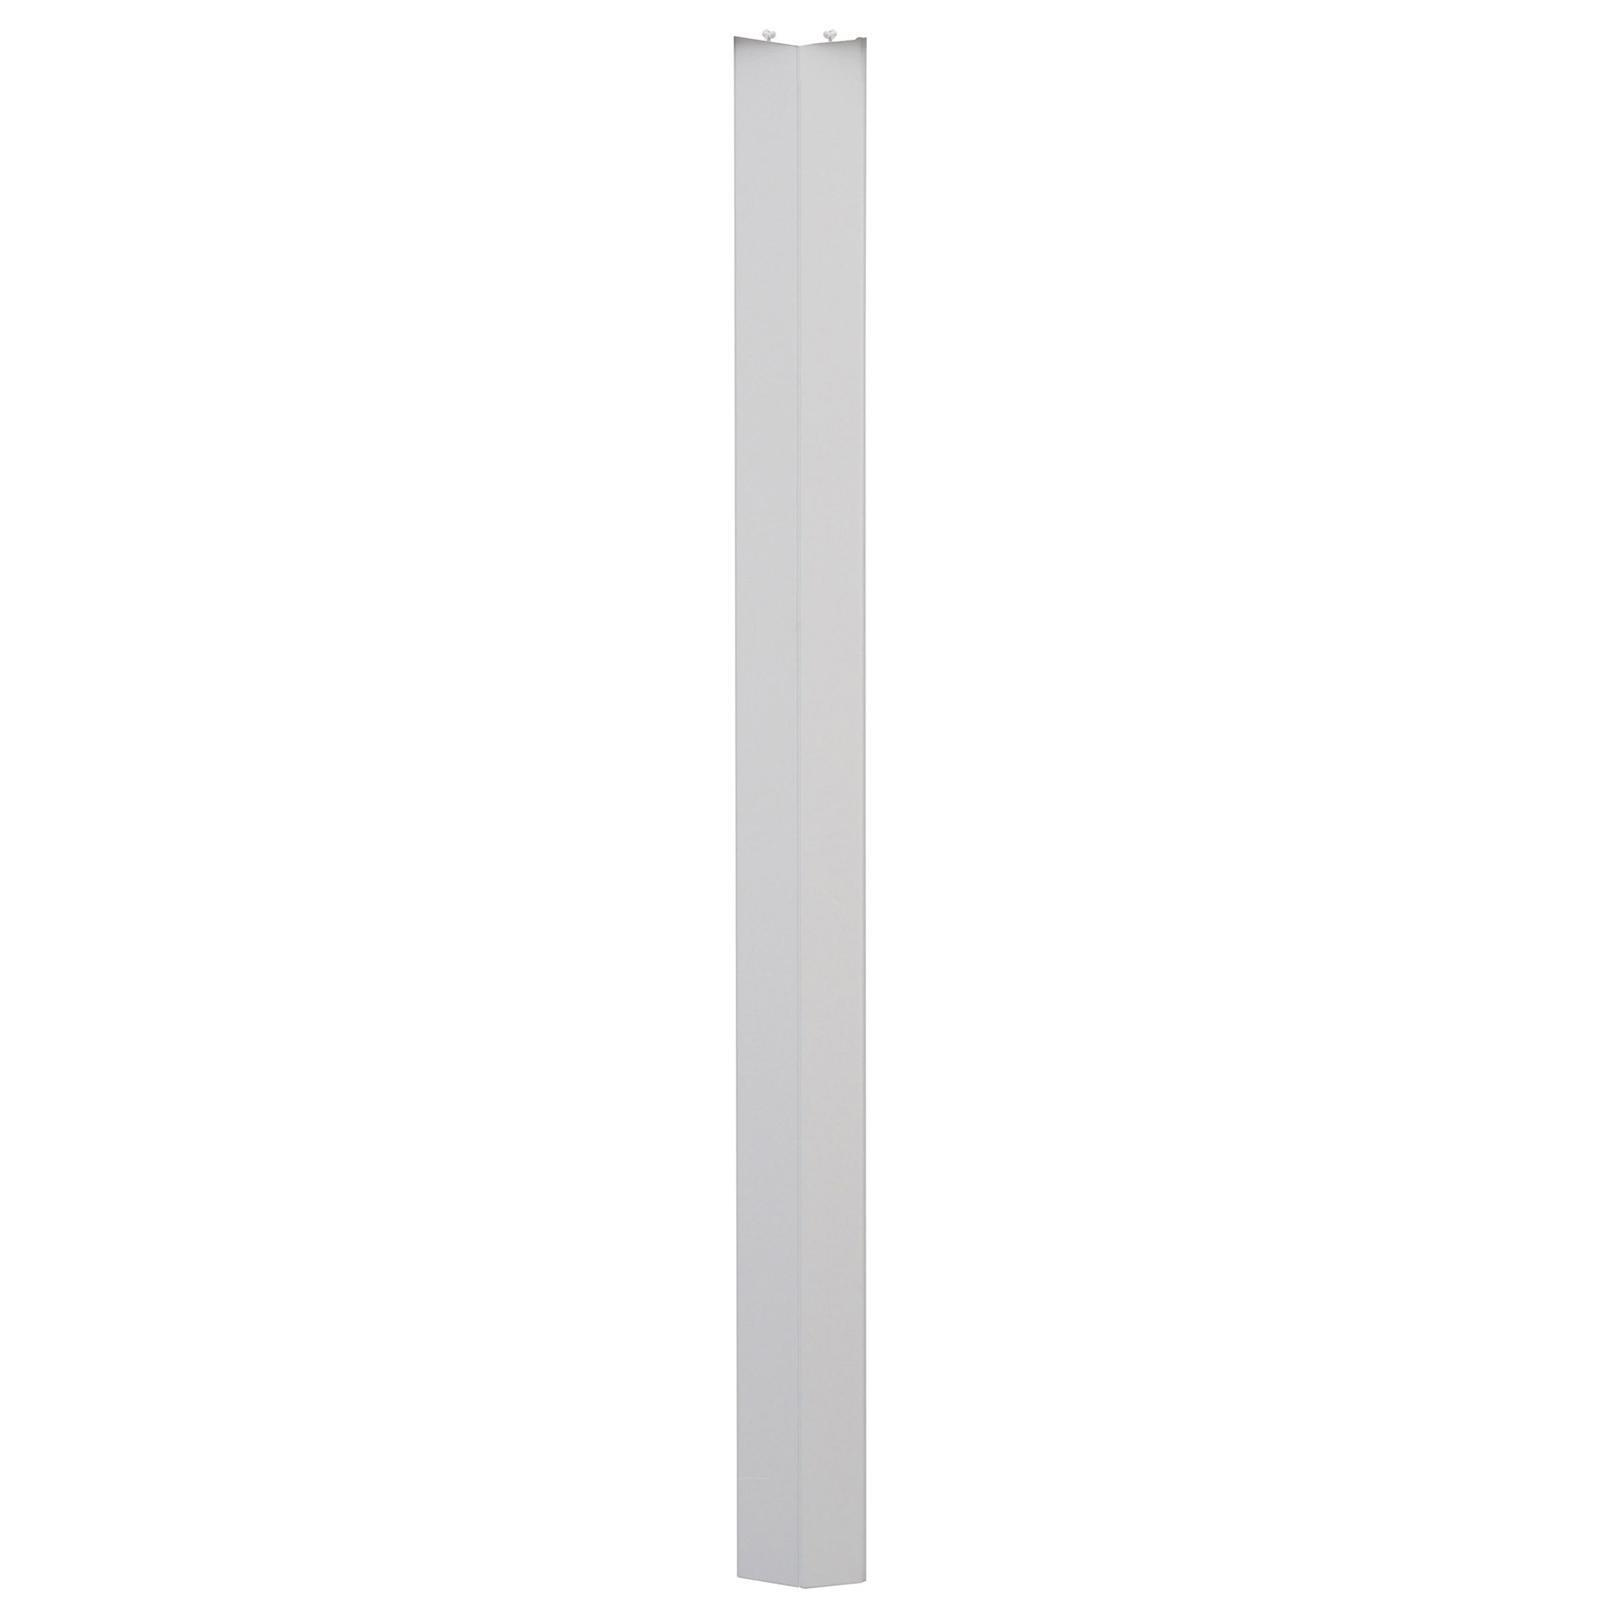 Pillar Products 11.5 x 240cm White Havana PVC Concertina Door Panels - 2 Pack